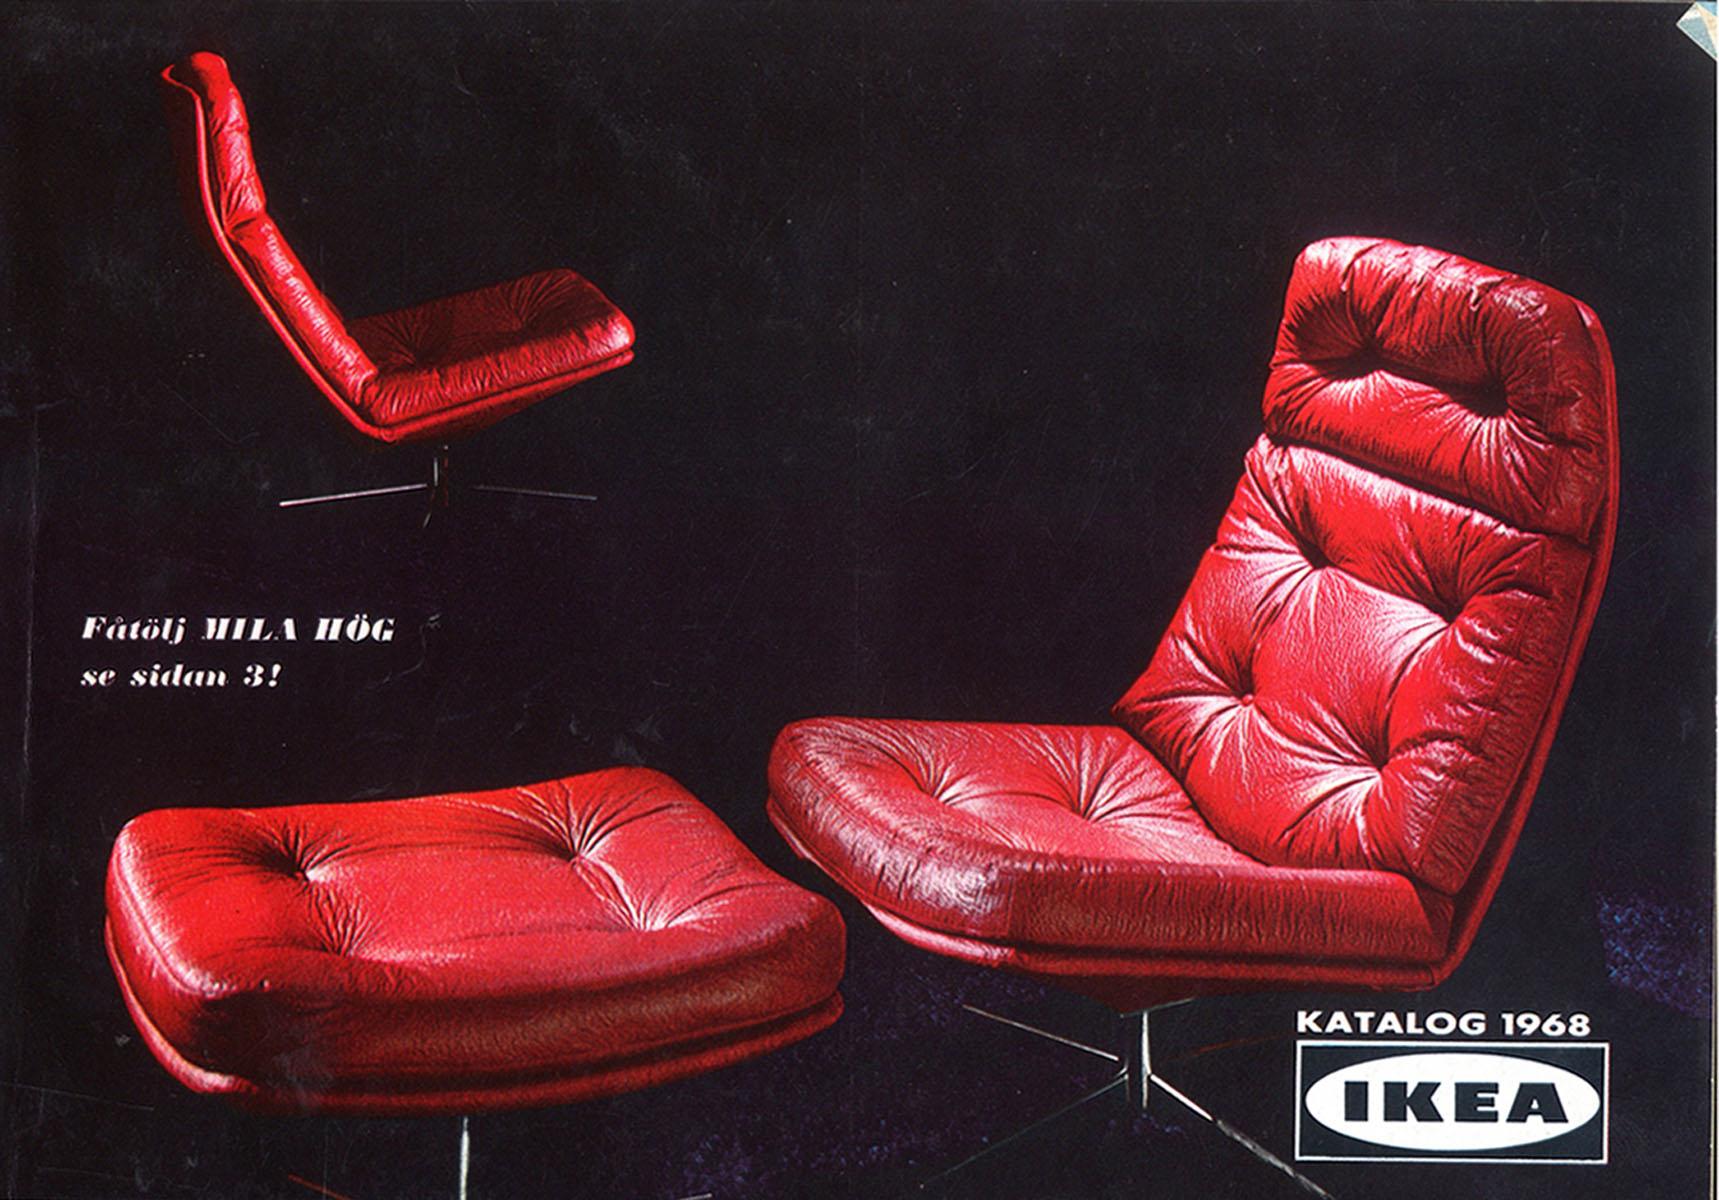 IKEA 1968 Catalog Interior Design Ideas